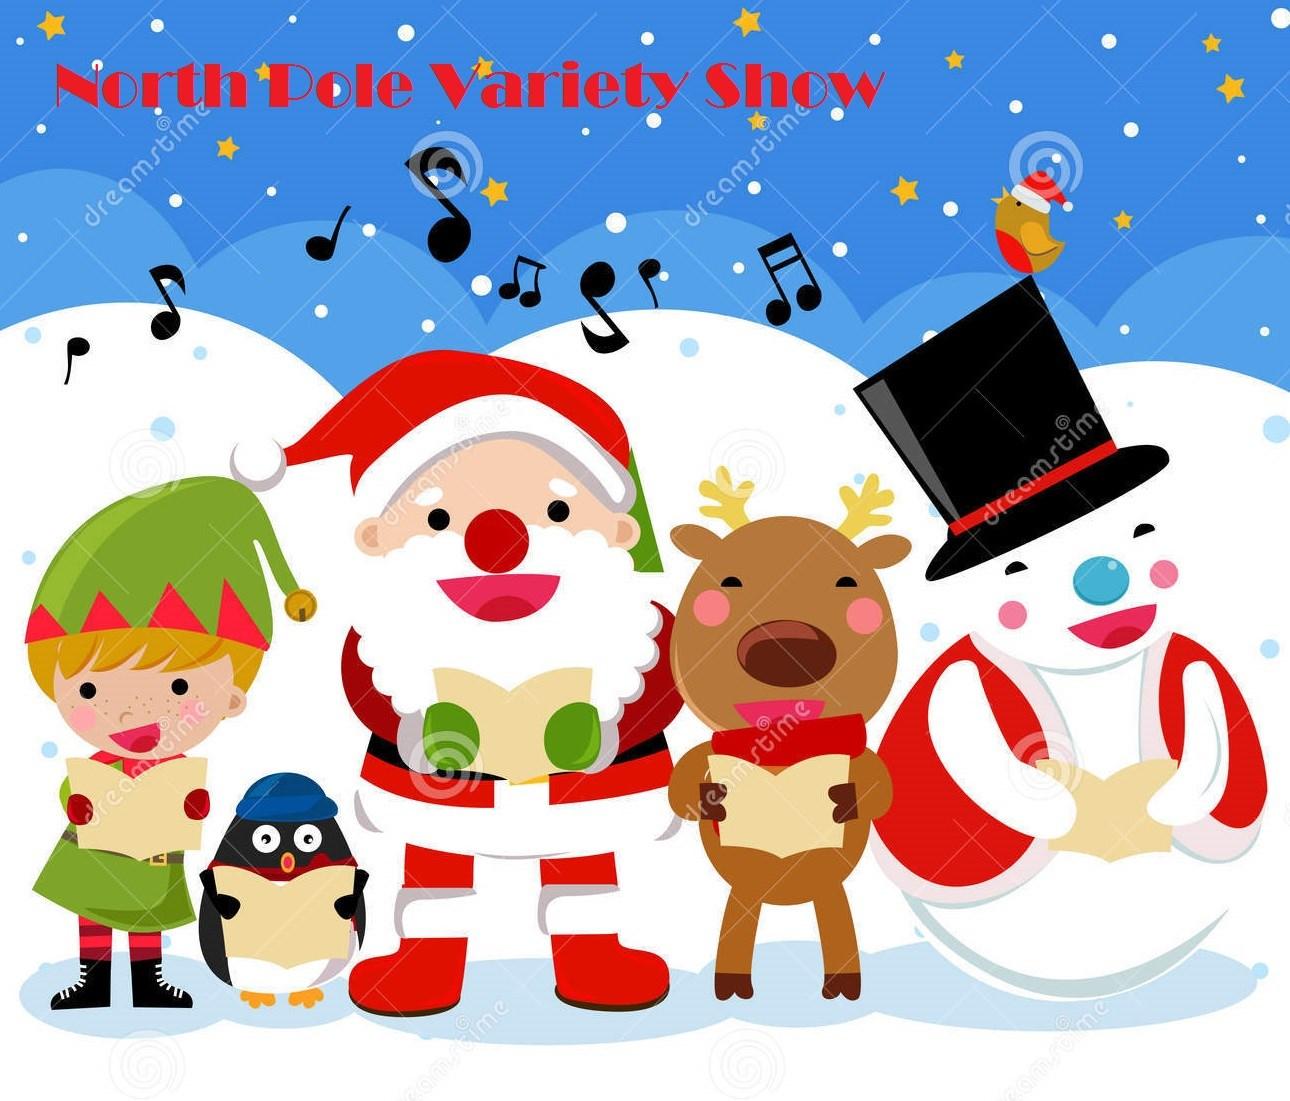 North Pole Variety Show